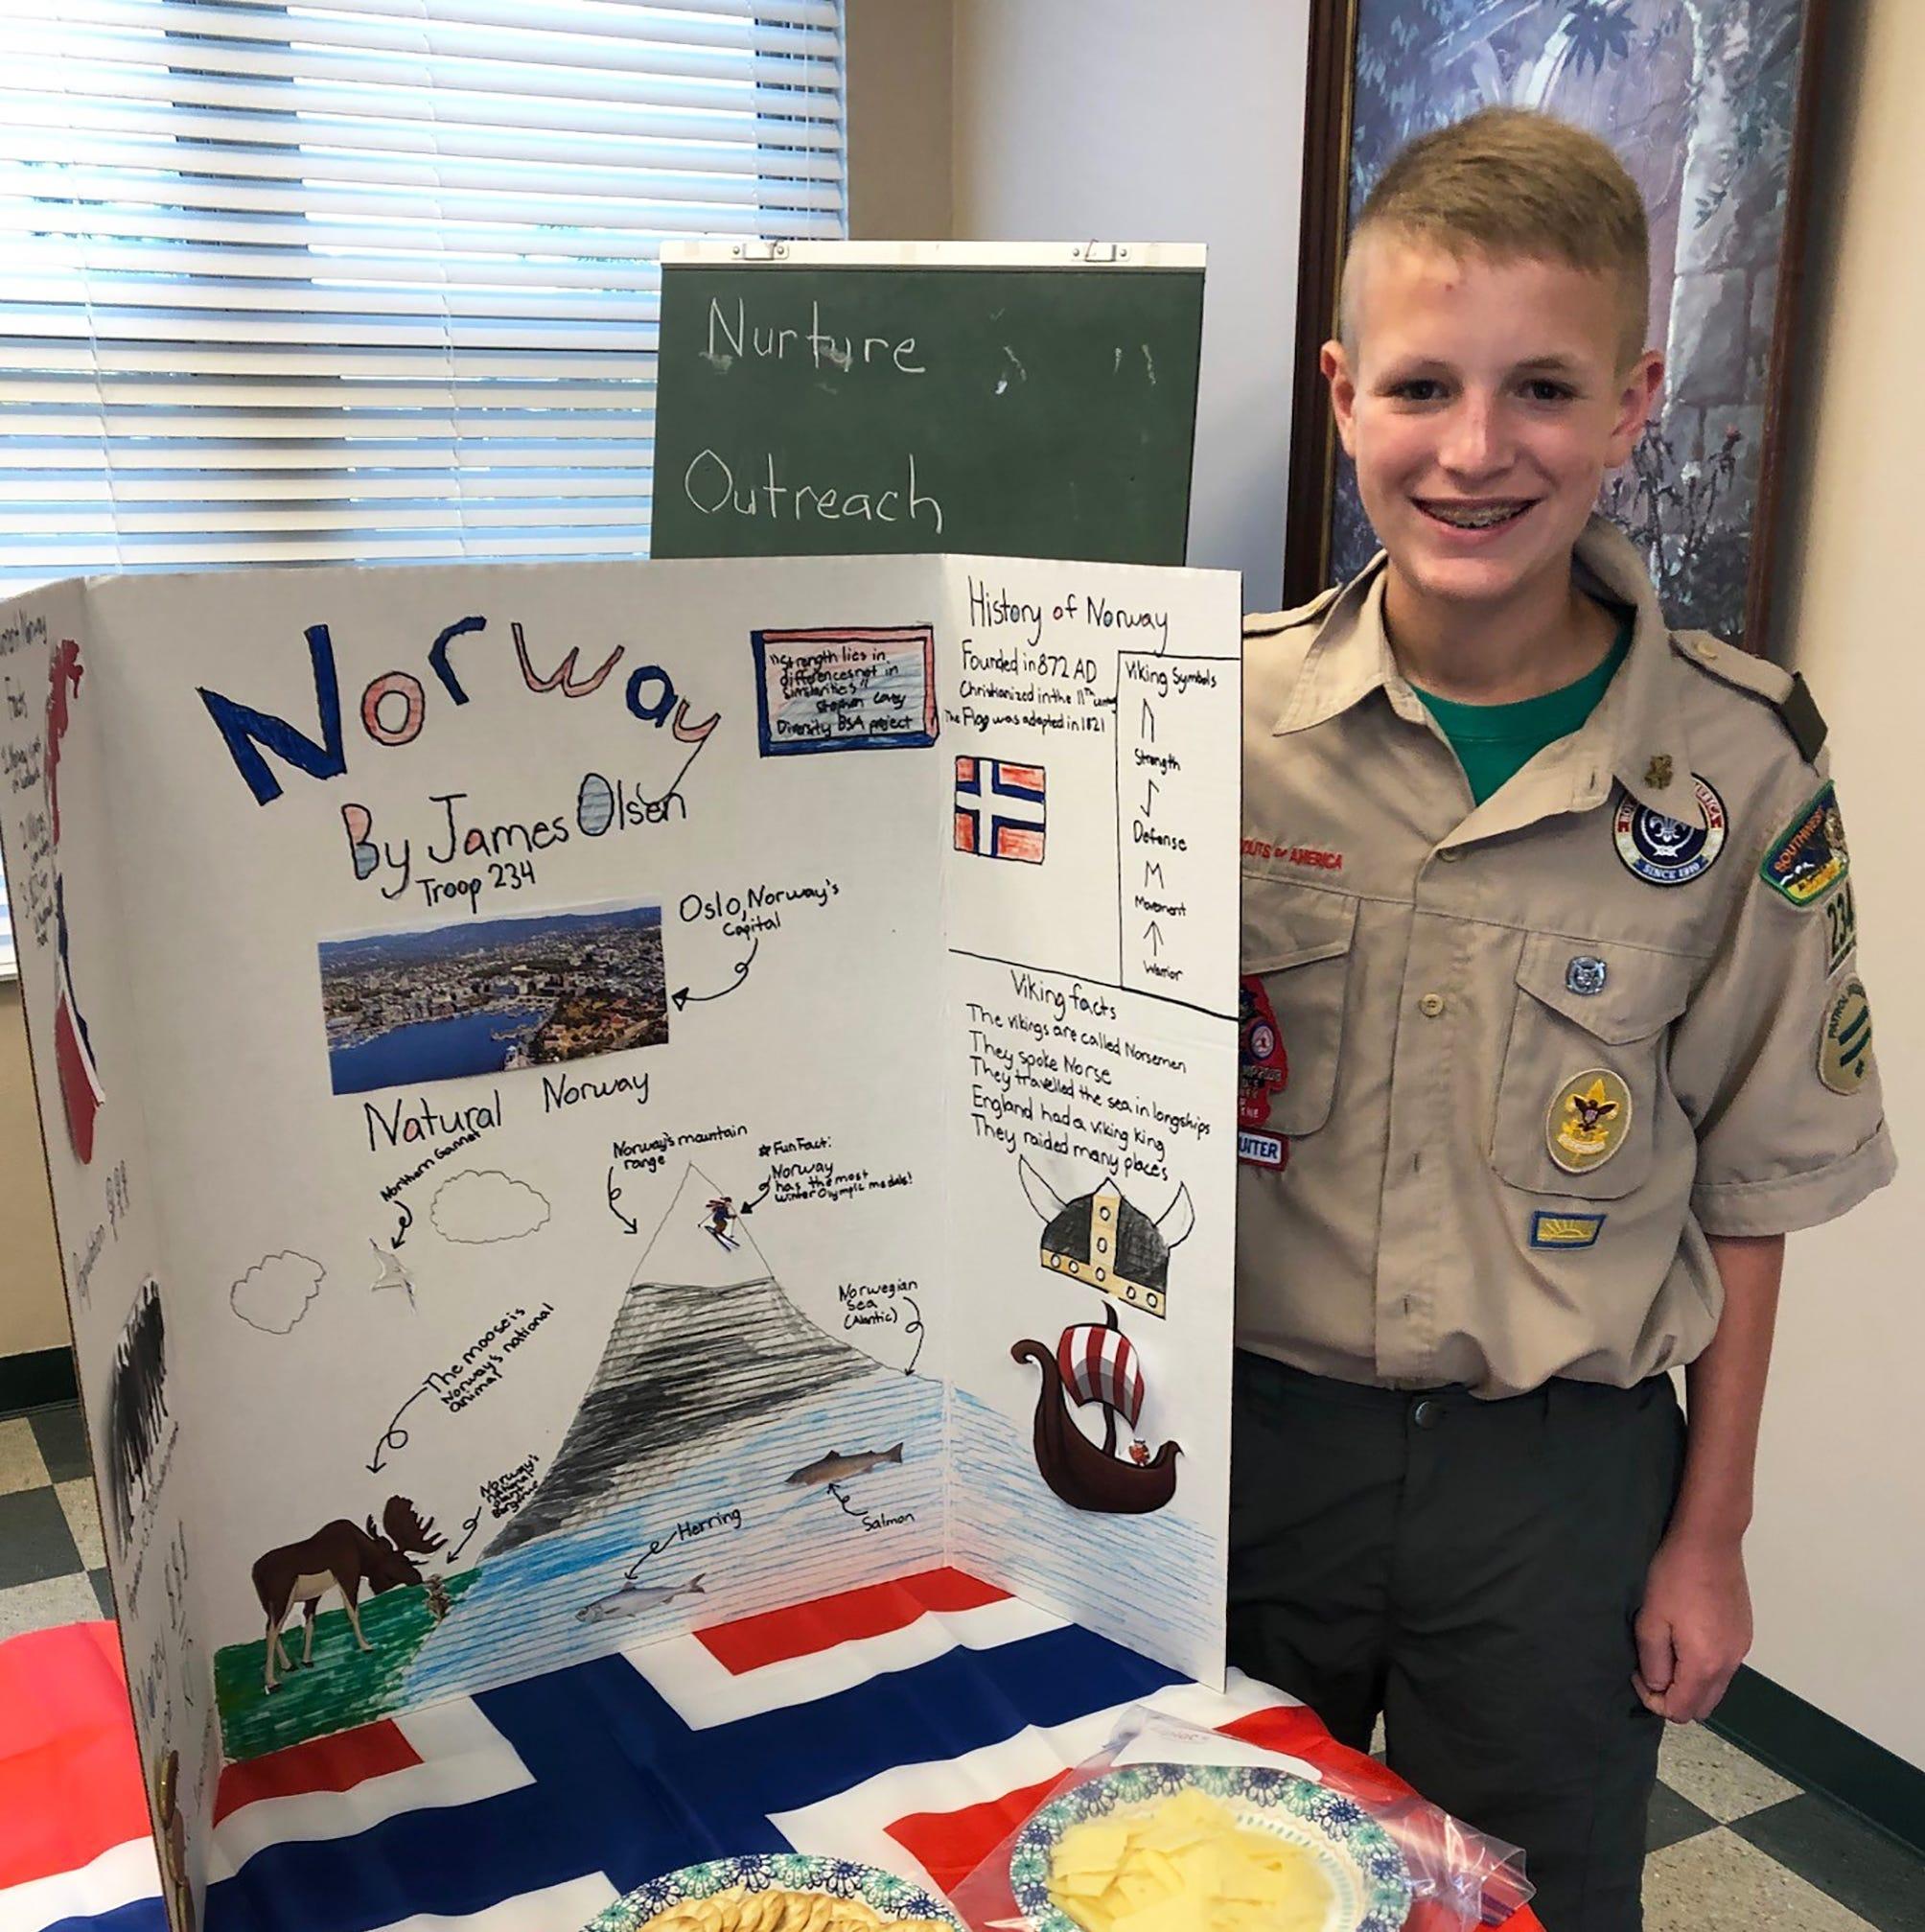 Boy Scout Troop 234 celebrates diversity